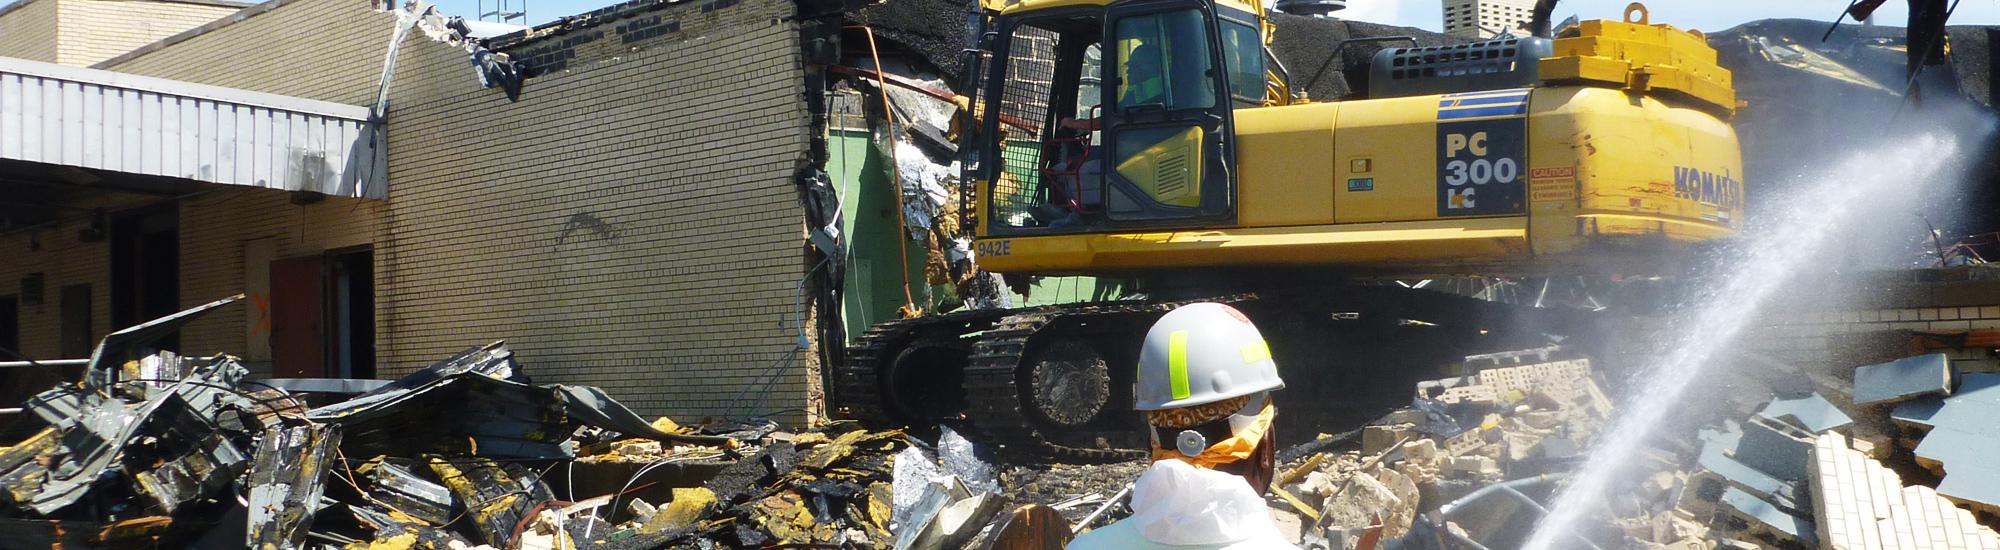 Clifton Former MGP Site Remediation – O.U.2